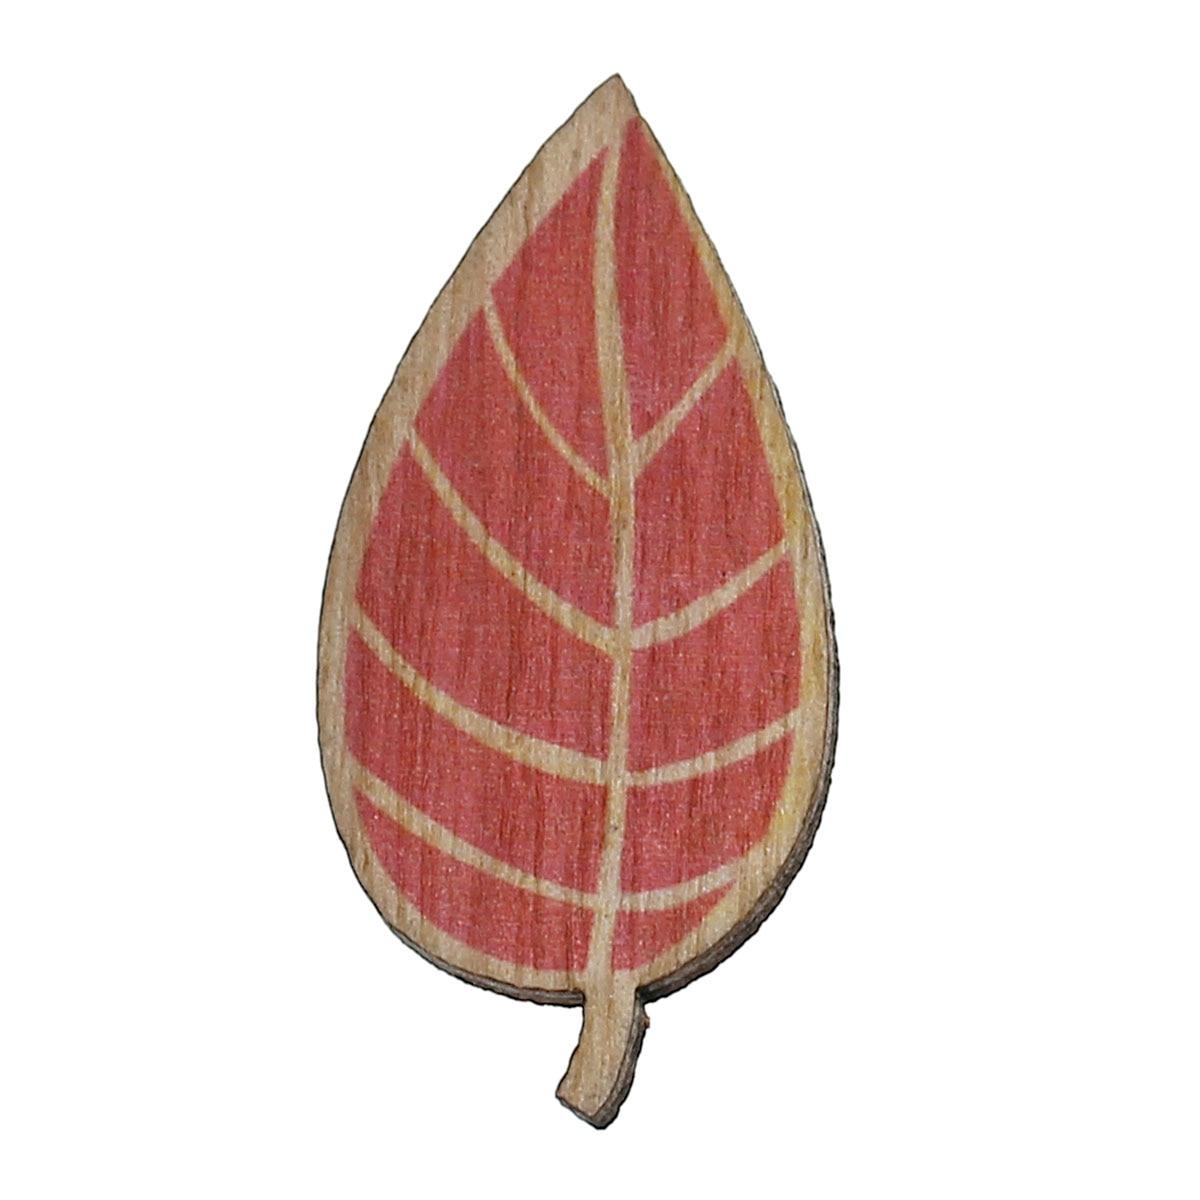 Wood Cabochons Scrapbooking Embellishments Findings Leaf Red 35mm(1 3/8)x 17mm(5/8),30 PCs new